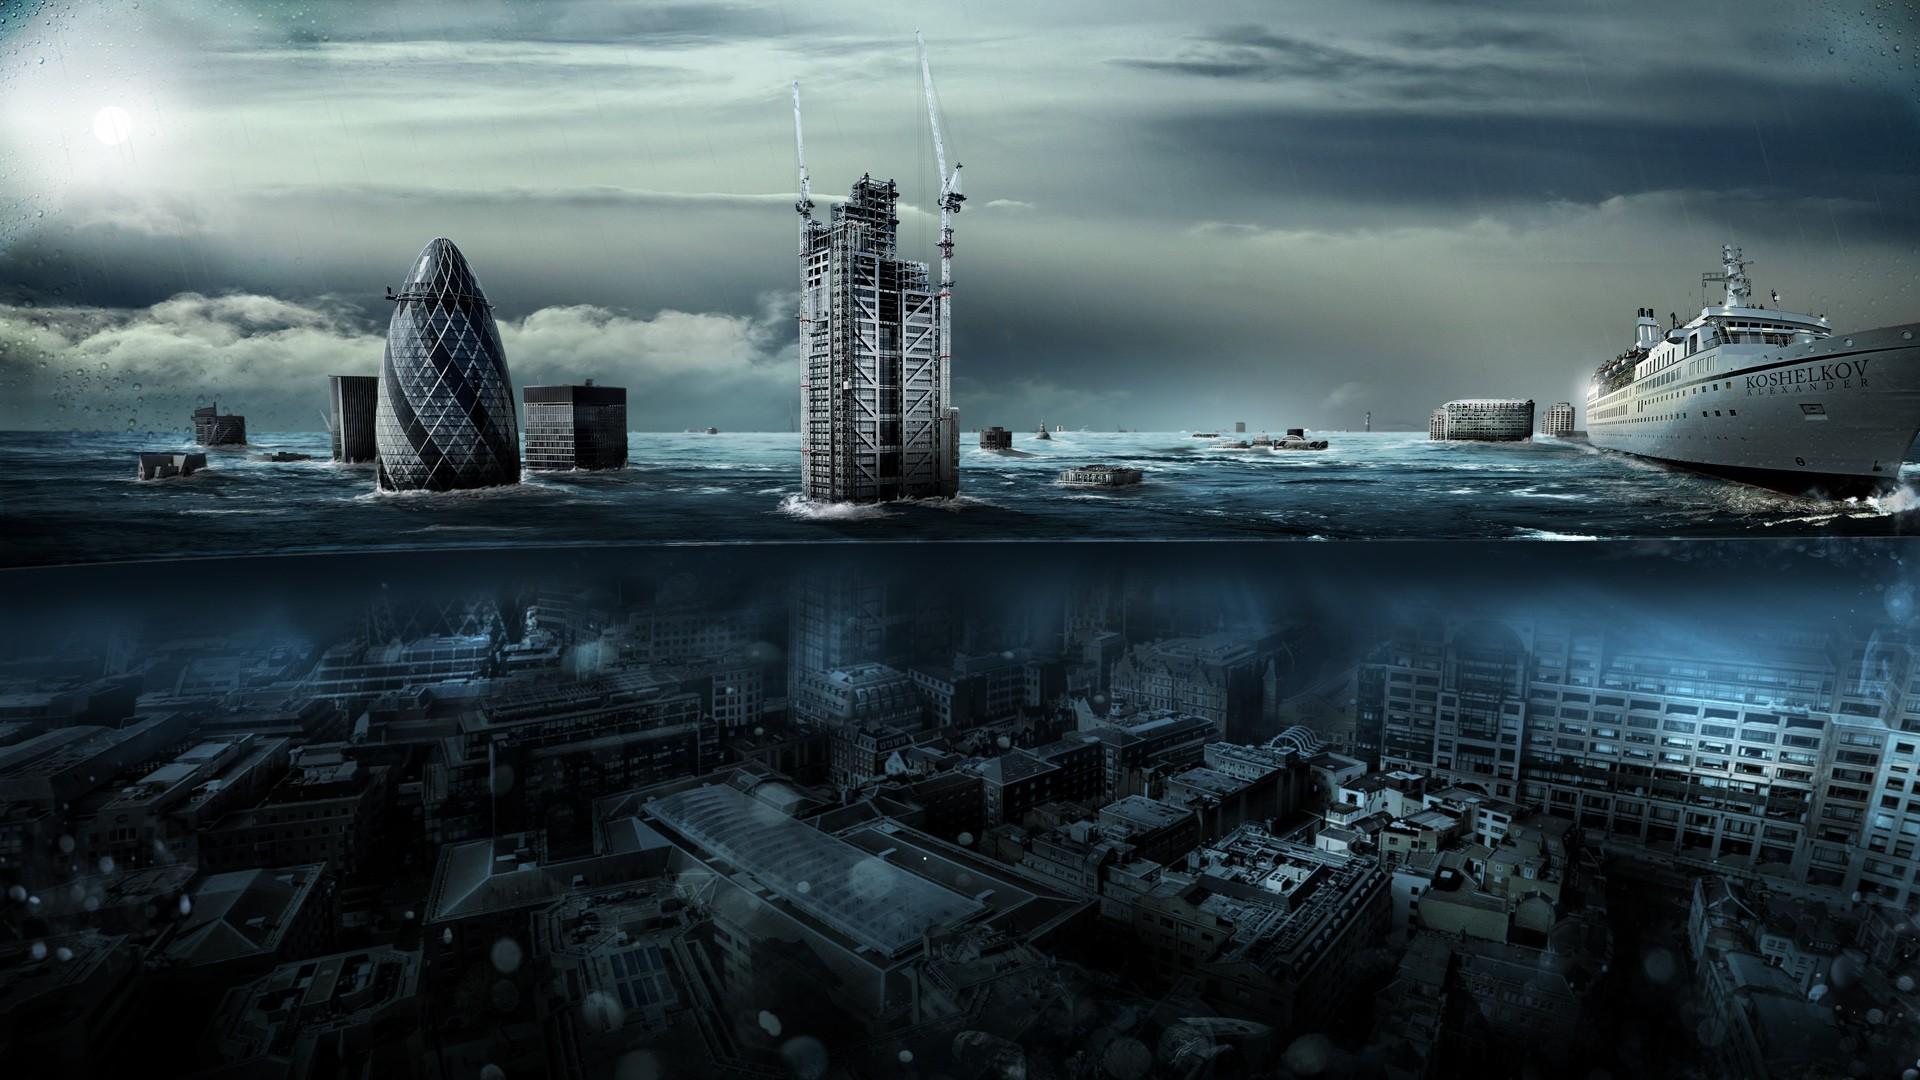 General 1920x1080 London England UK split view sunken cities digital art Alexander Koshelkov city Tsunami photo manipulation